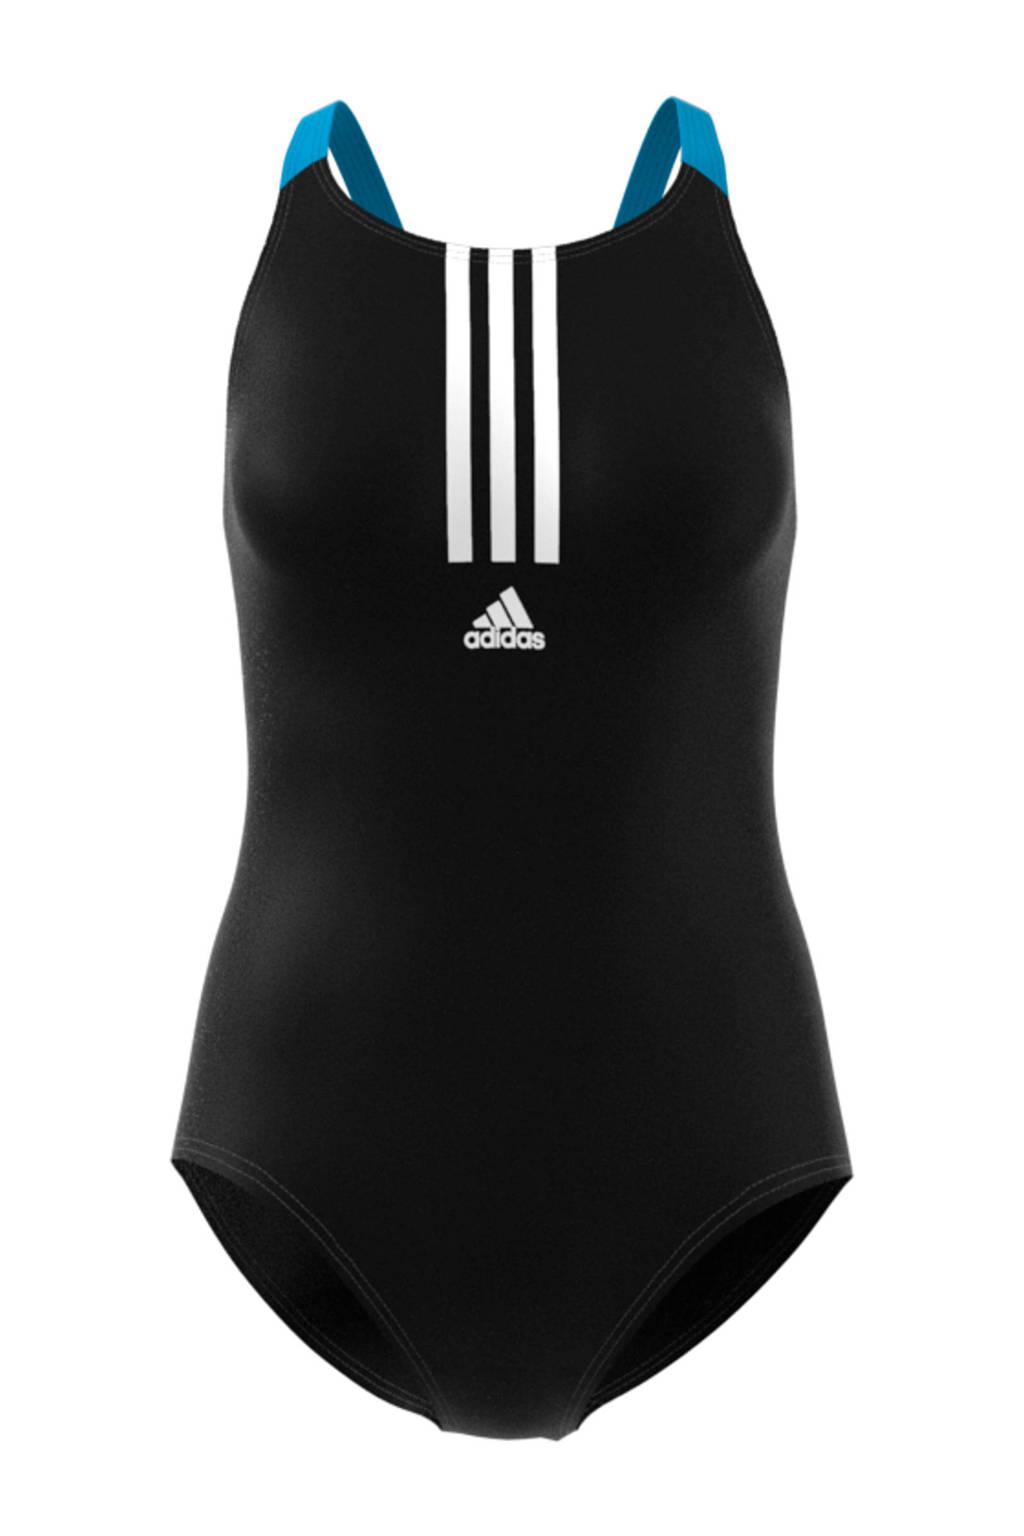 adidas sportbadpak zwart, Zwart / Blauw